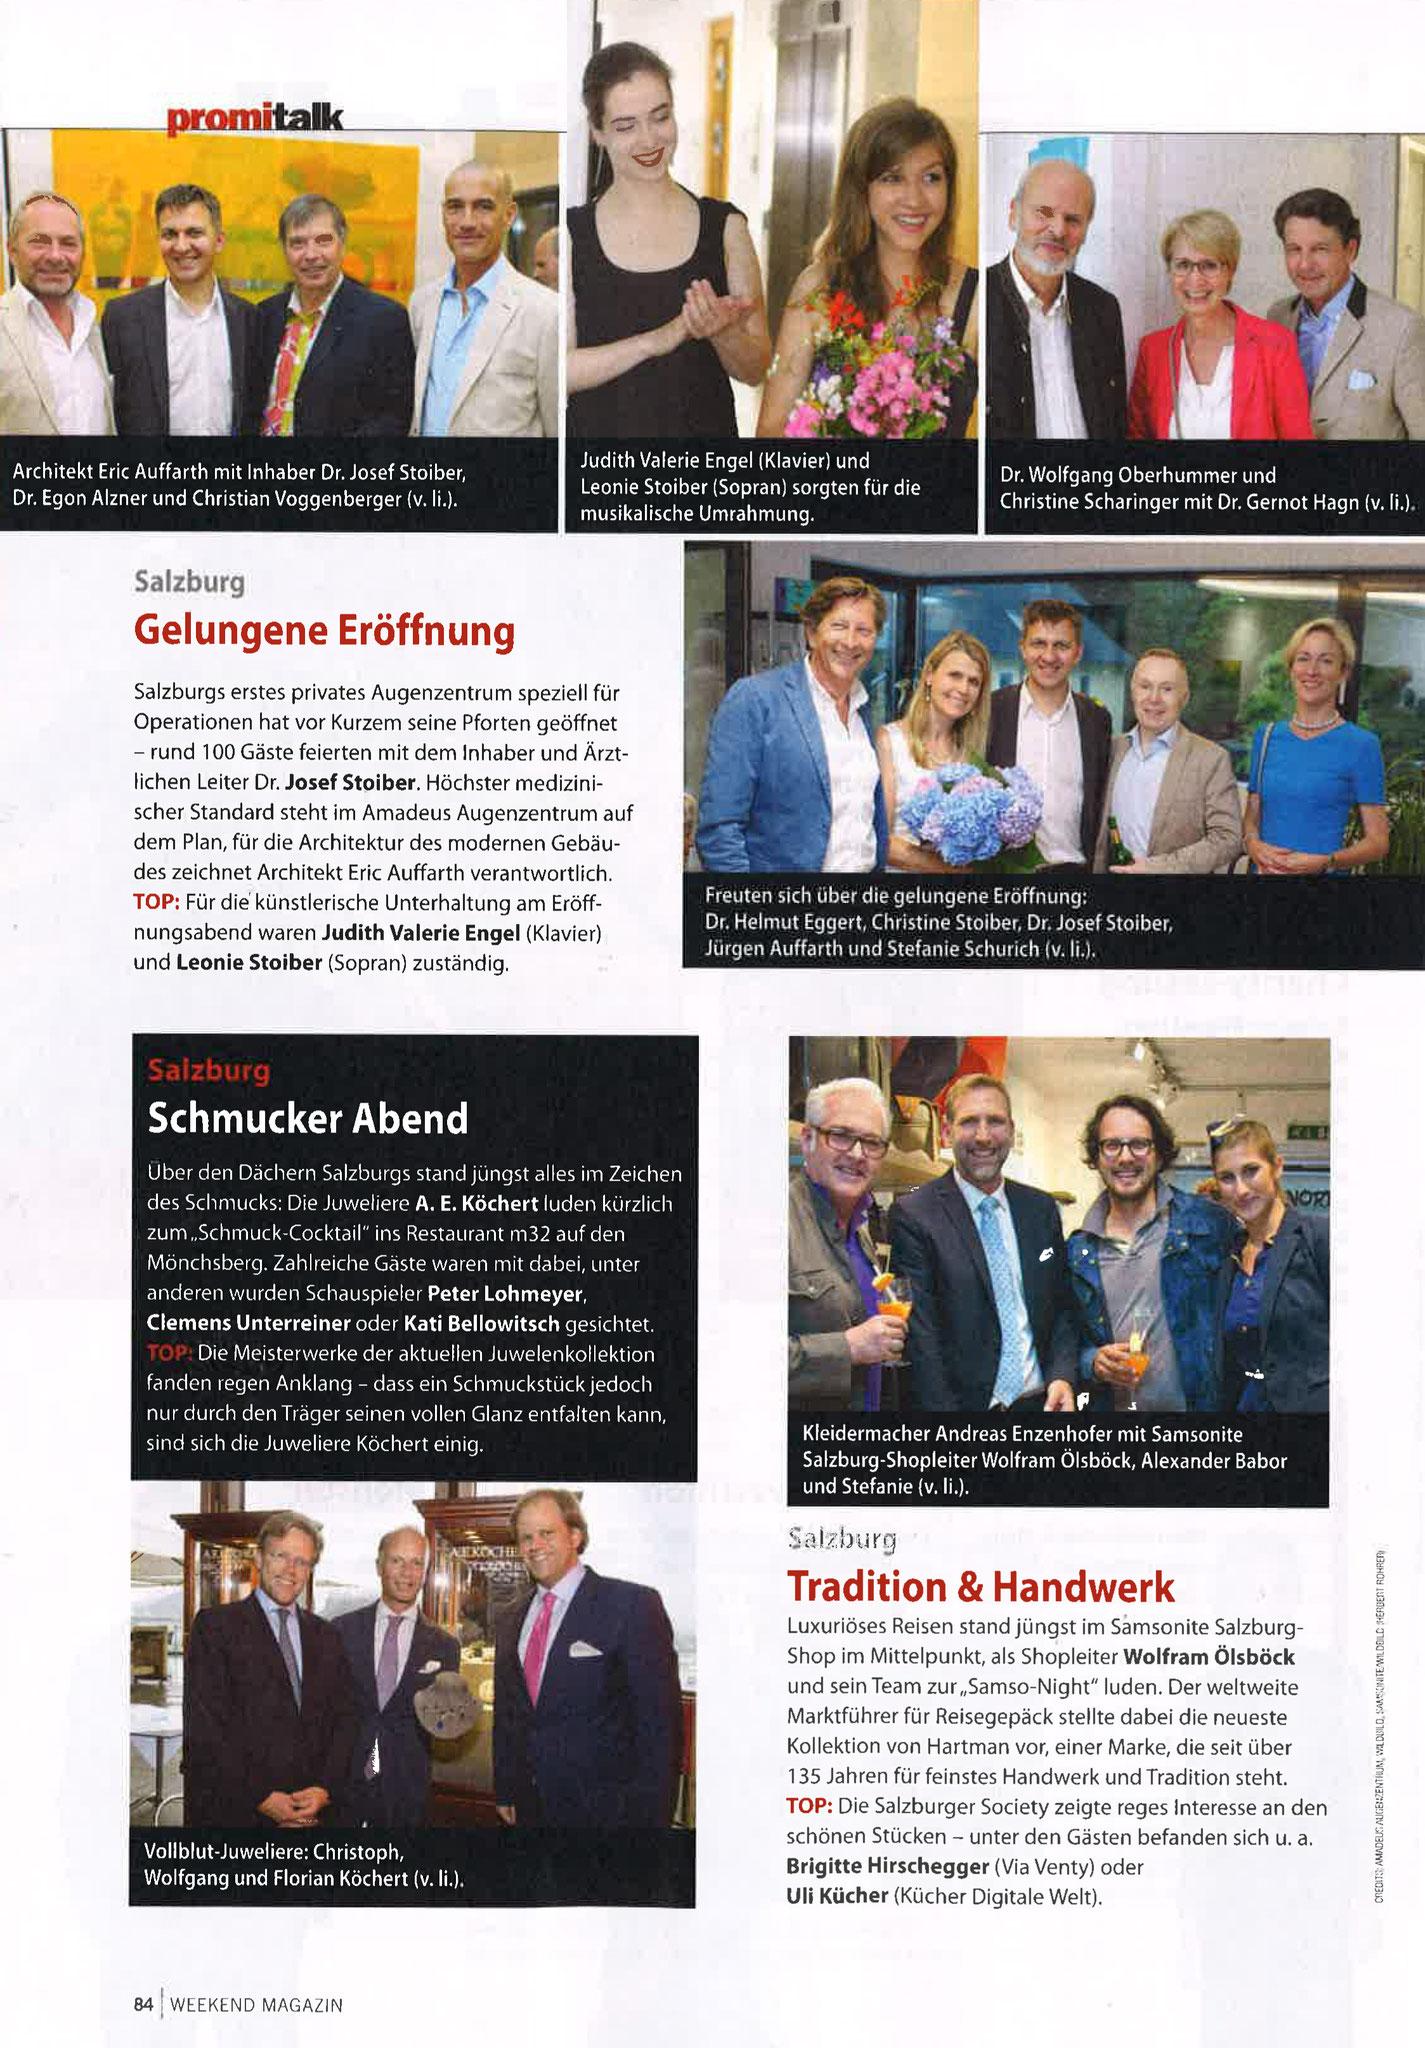 WEEKEND Magazin, 26. August 2016